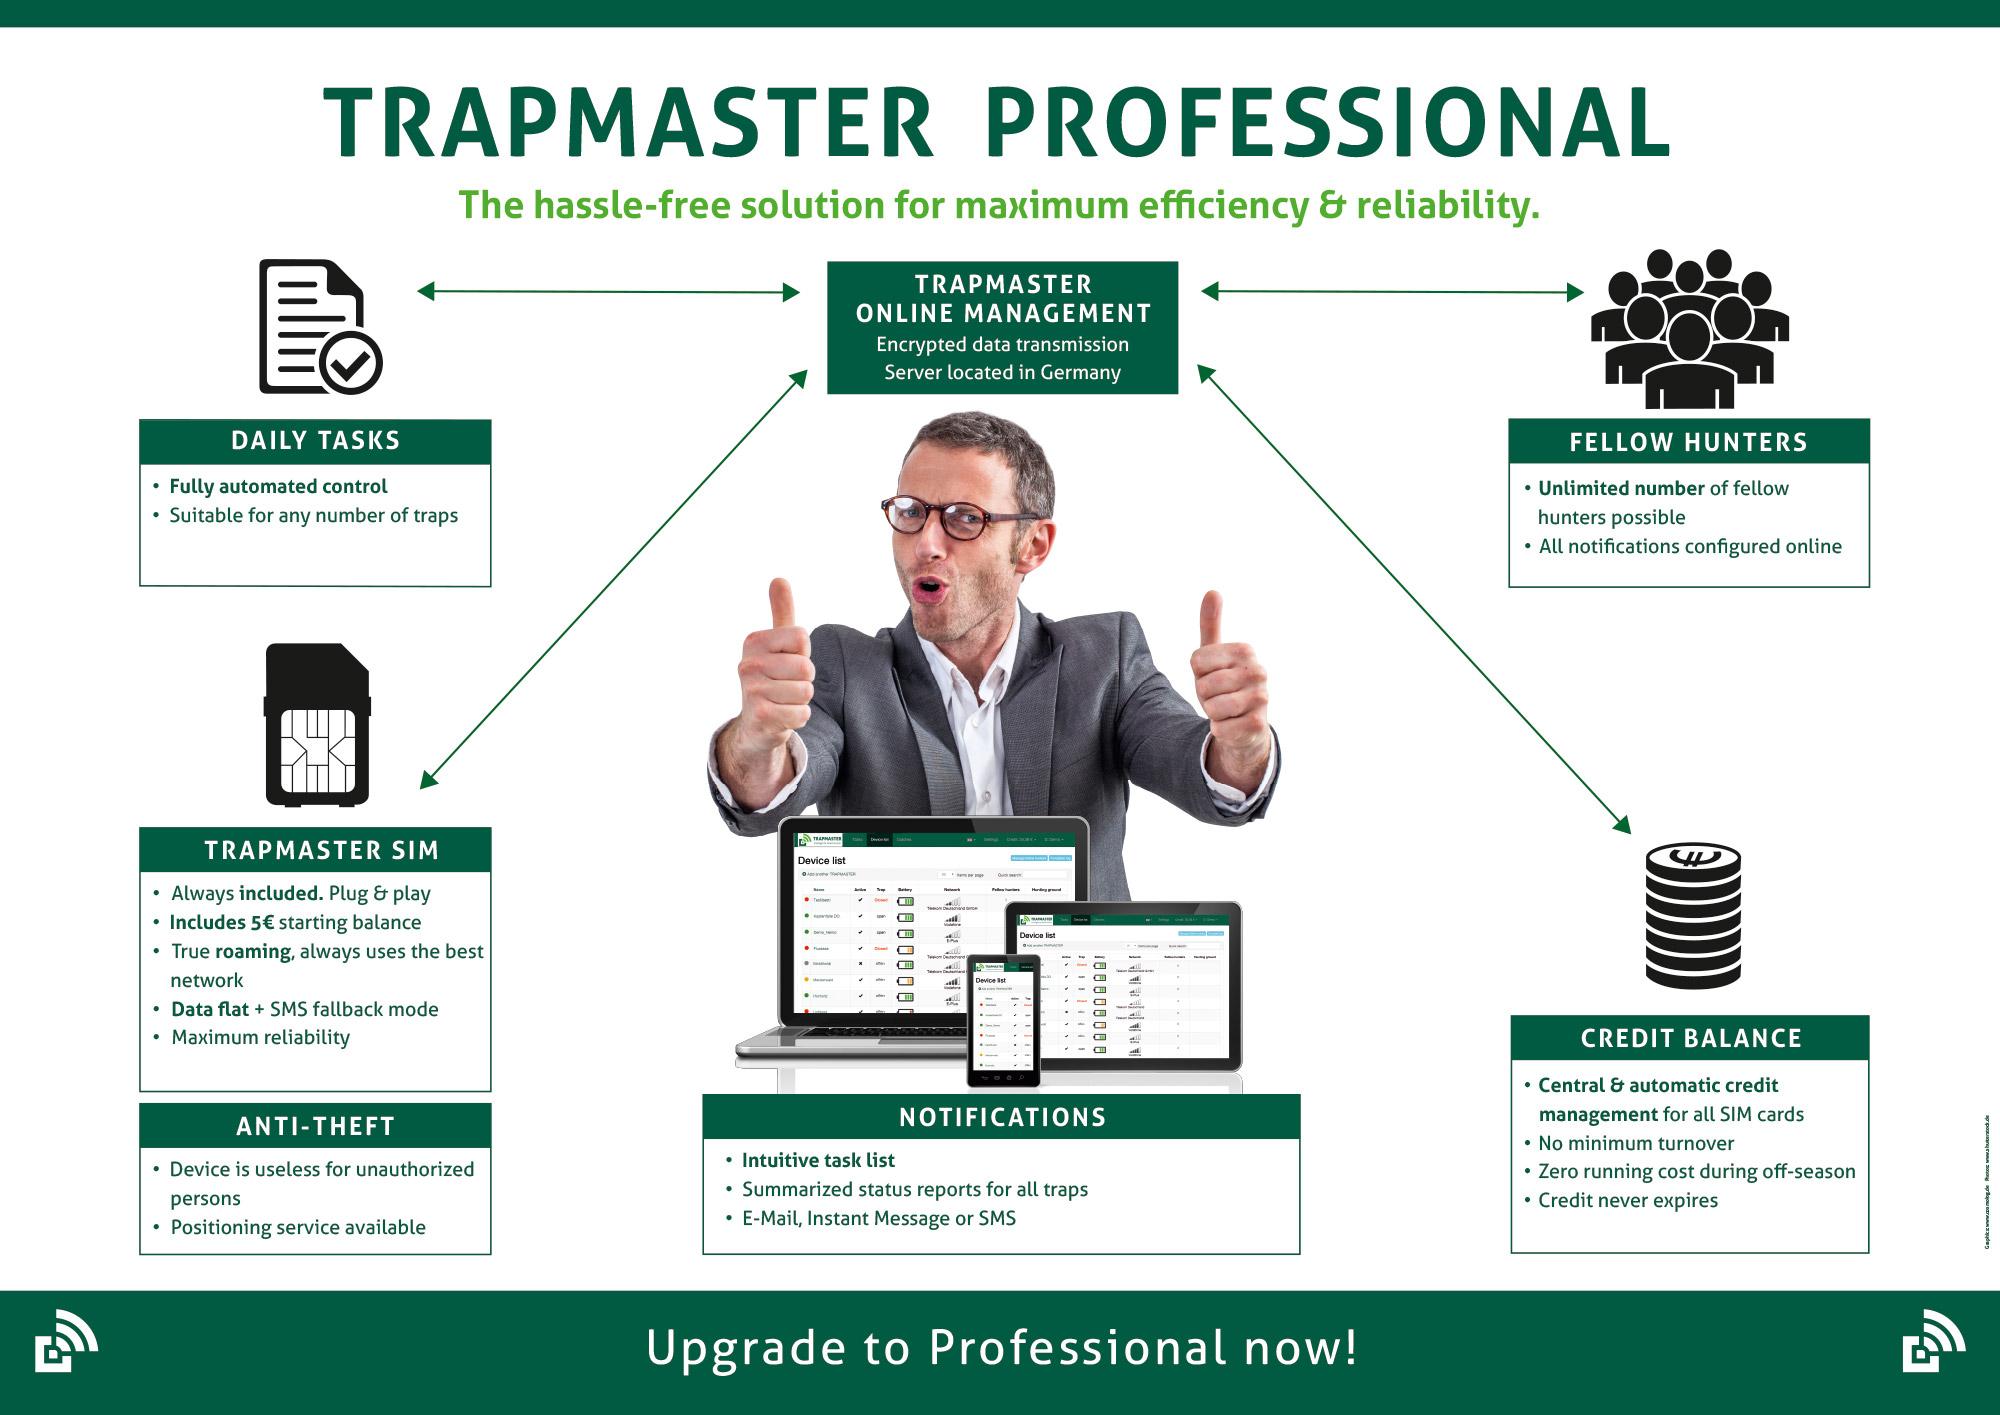 TRAPMASTER Online Management